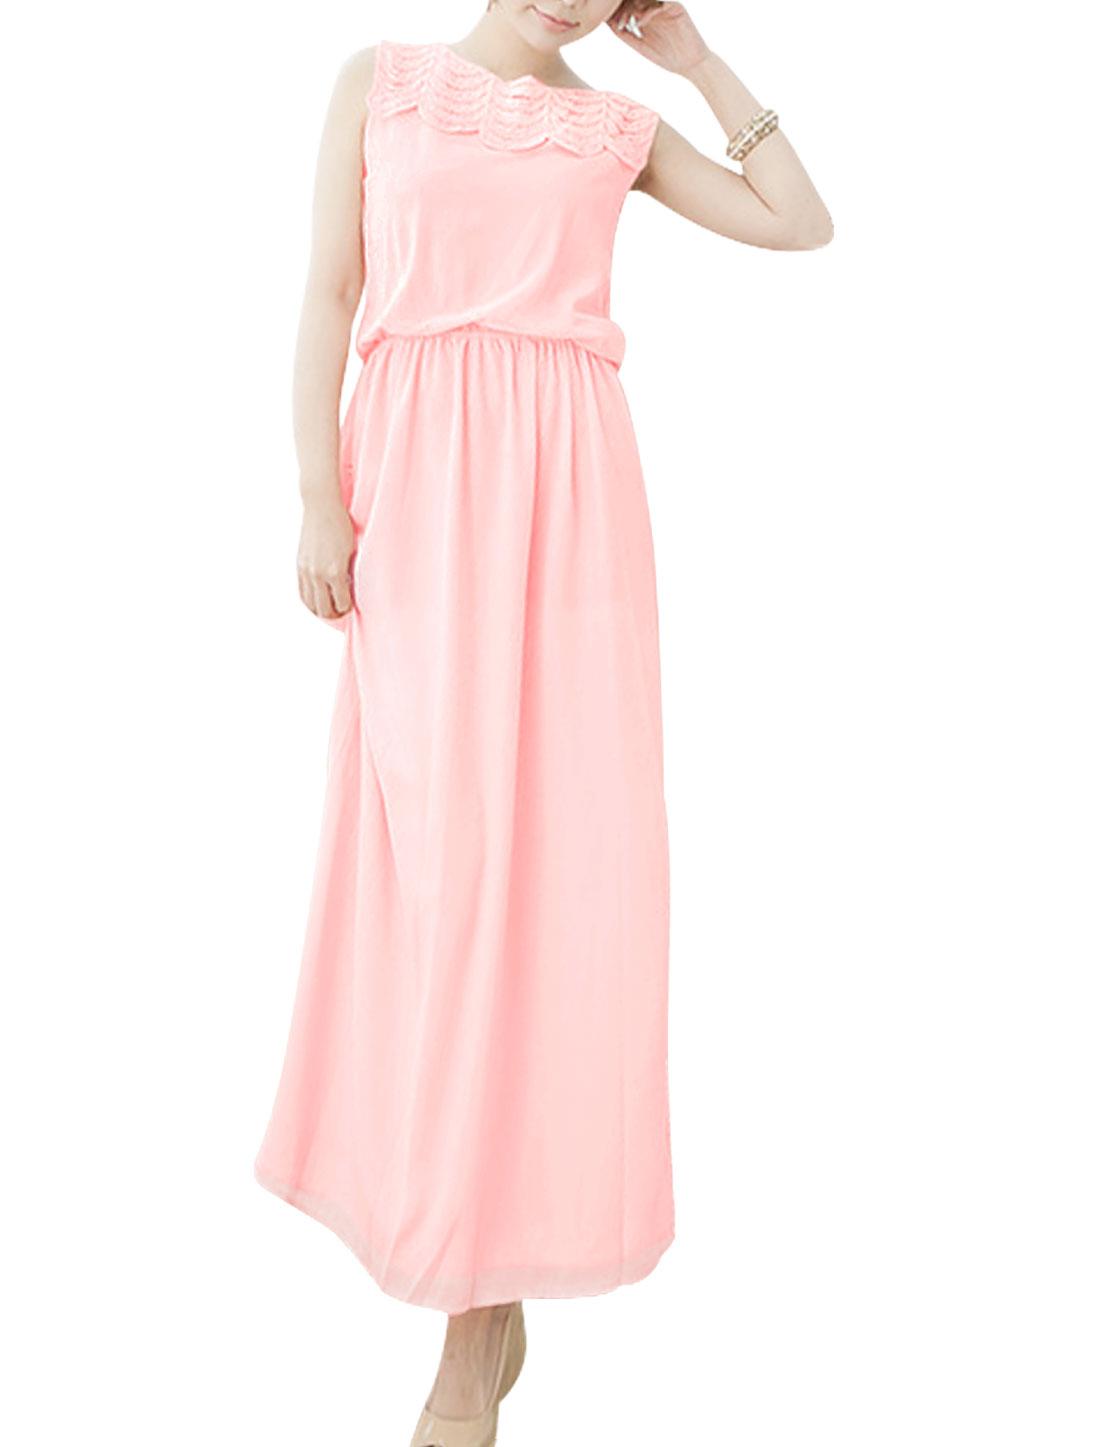 Lady Crochet Panel Lining Full-Length Blouson Dress Light Pink XS